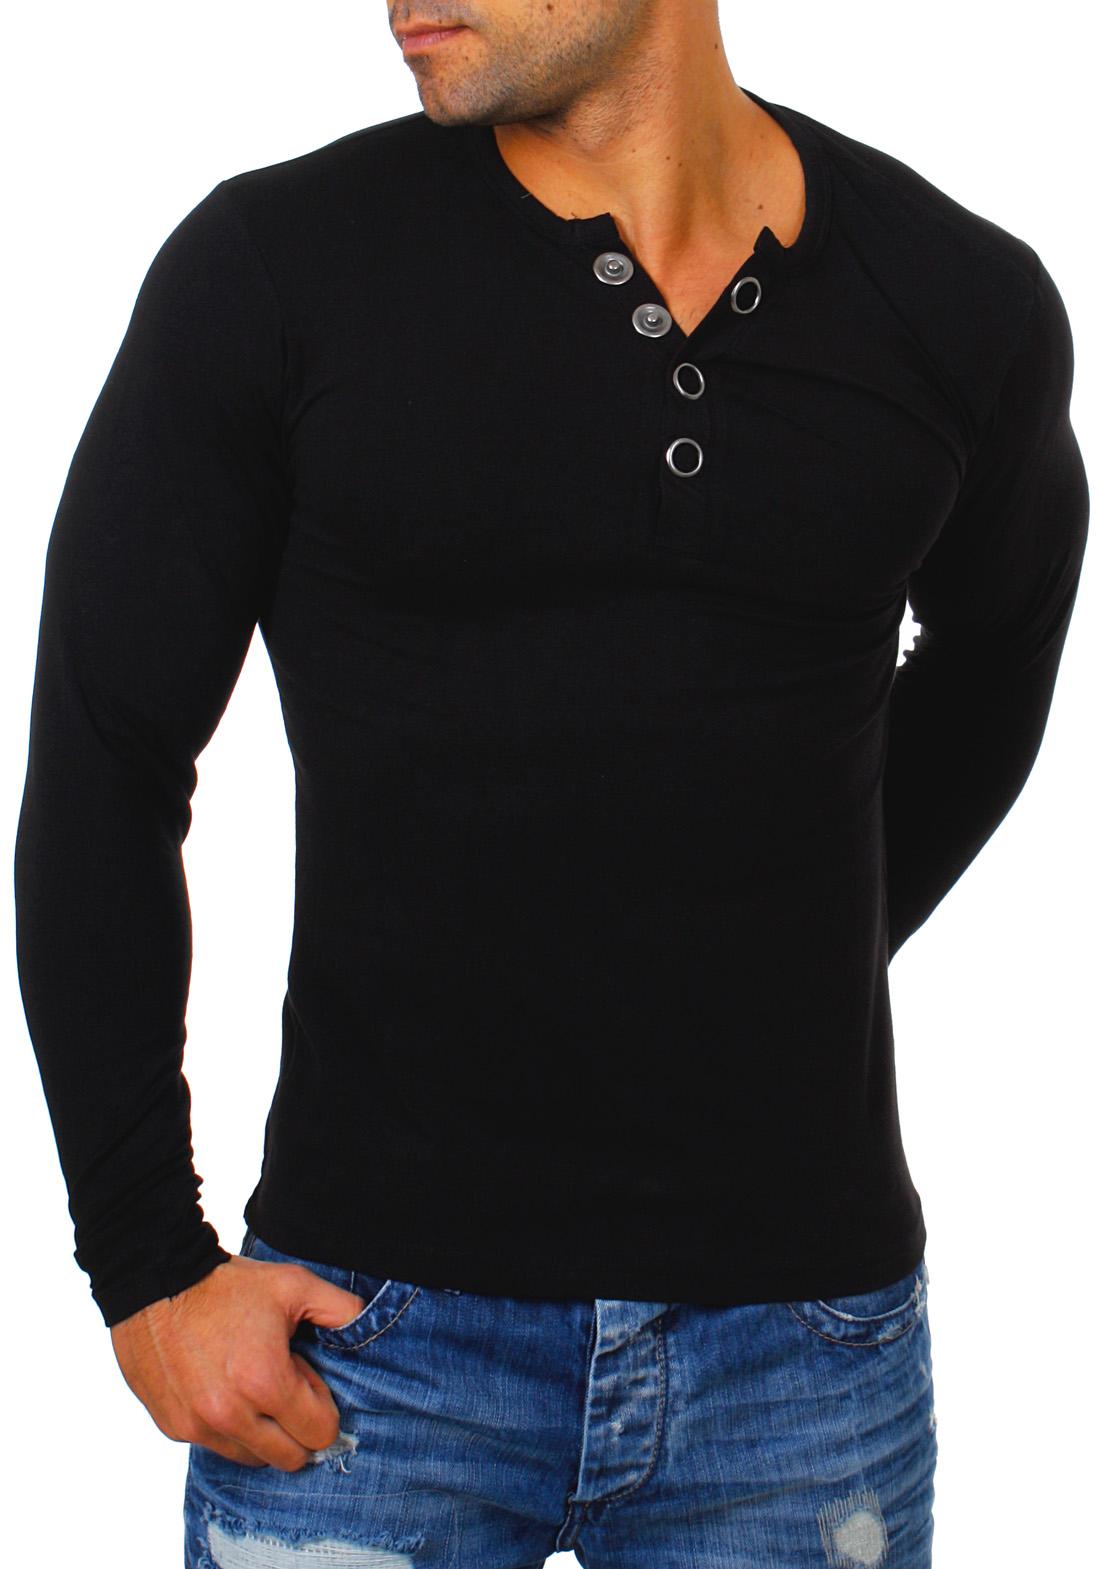 bieten viel billig zu verkaufen neueste auswahl Details zu Young & Rich Herren Longsleeve langarm T-Shirt Knopfleiste big  buttons stretch